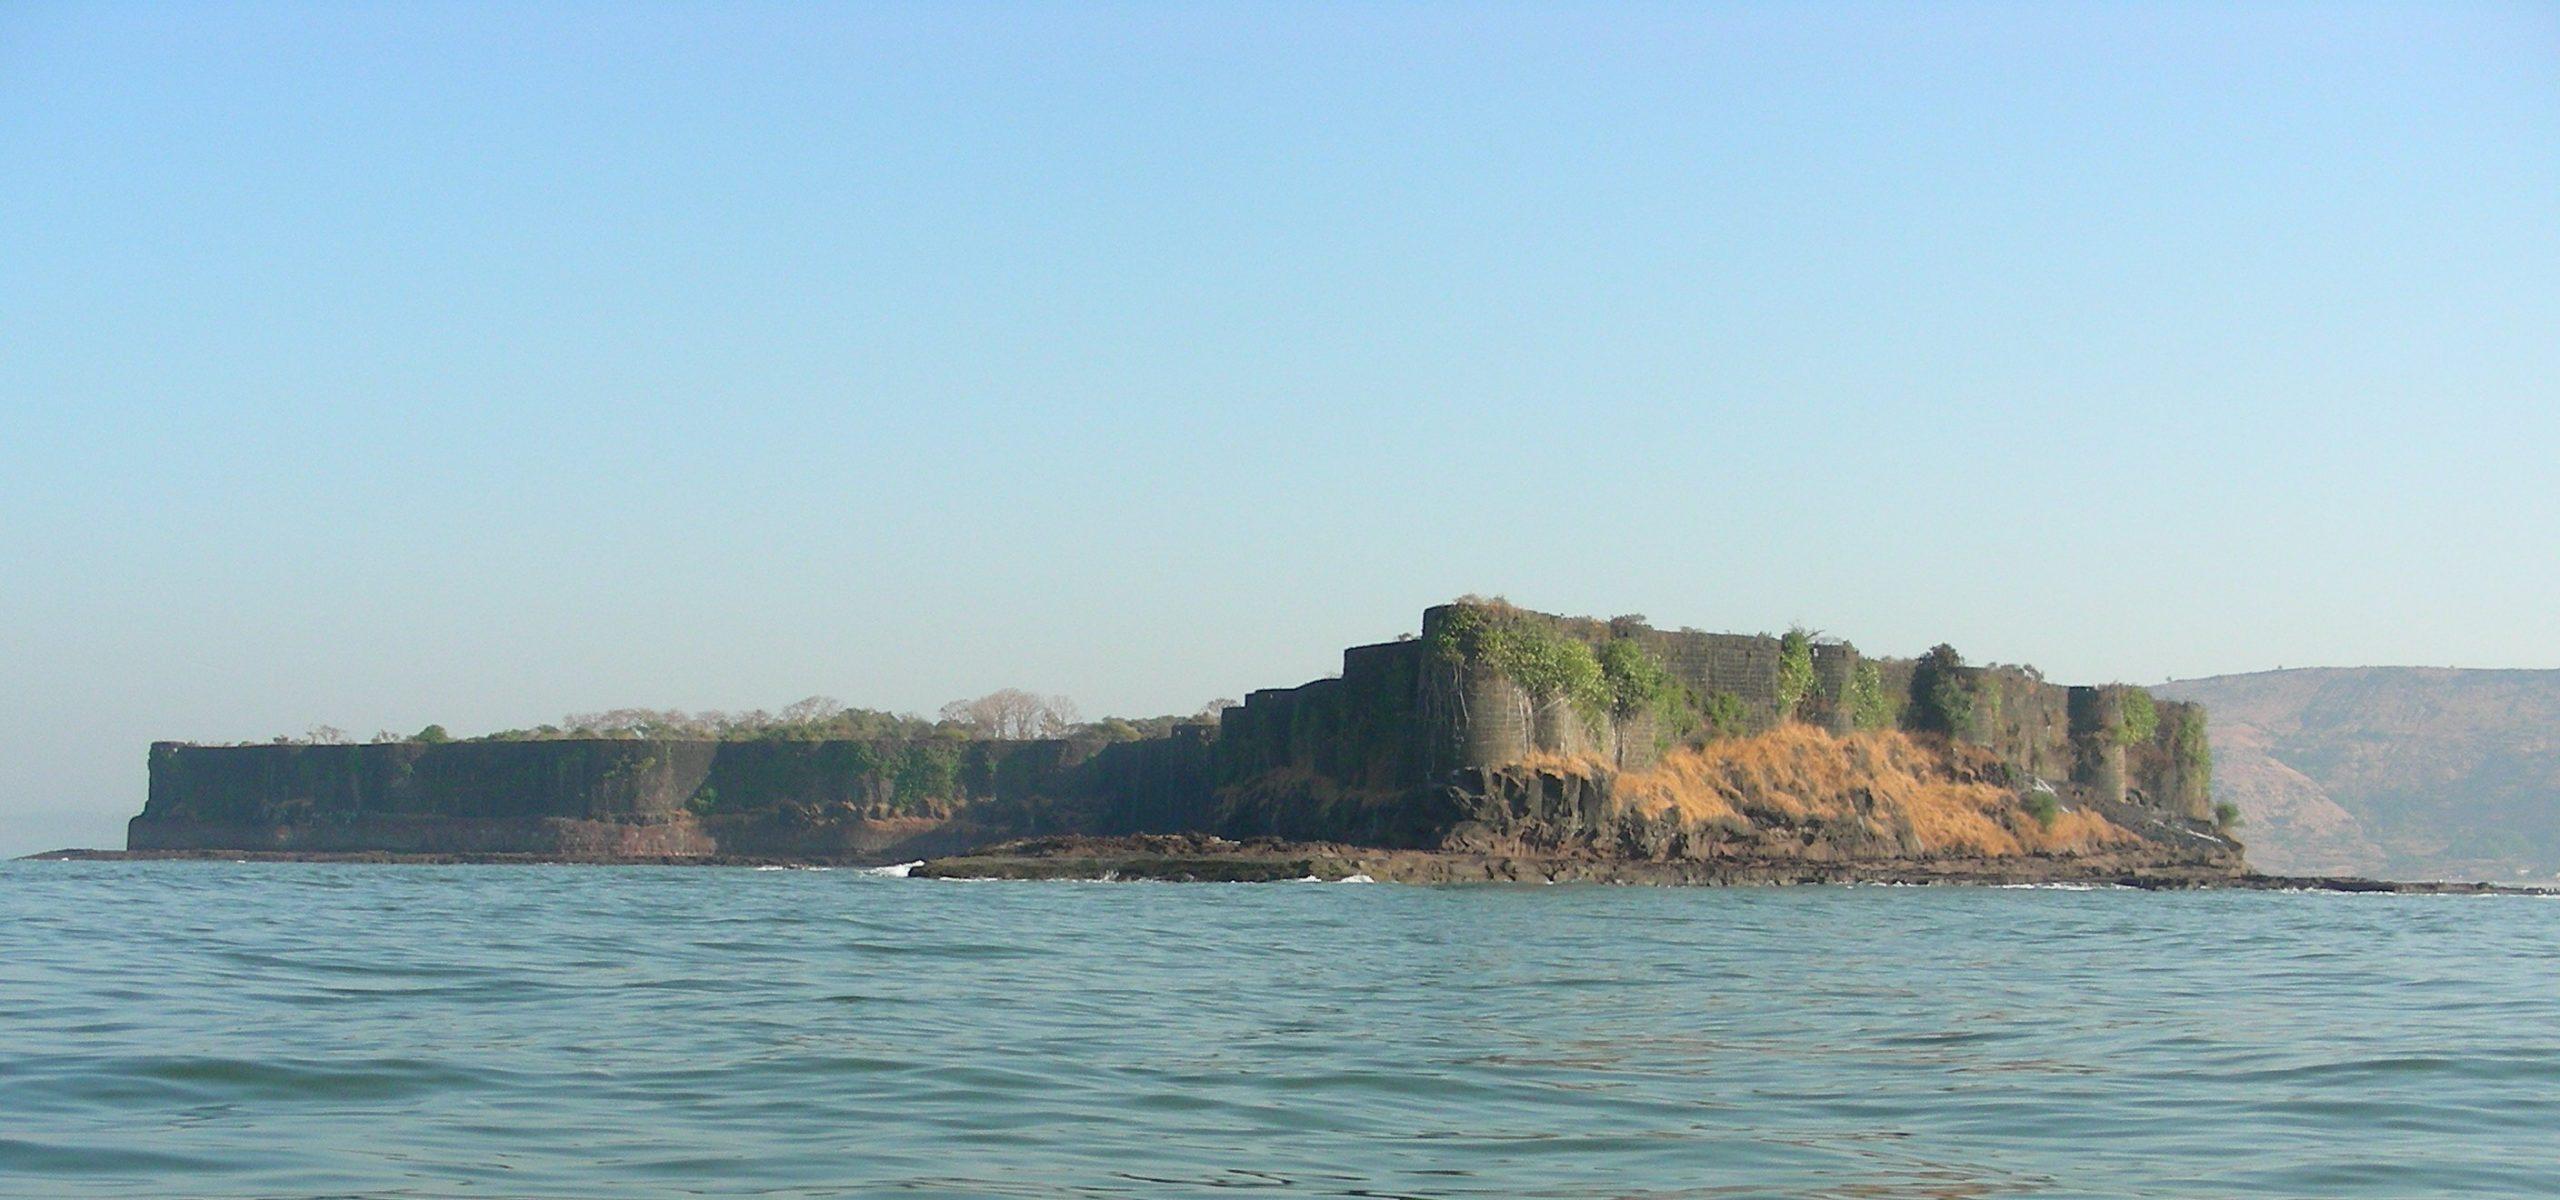 Must-Visit Suvarnadurga Fort in Ratnagiri